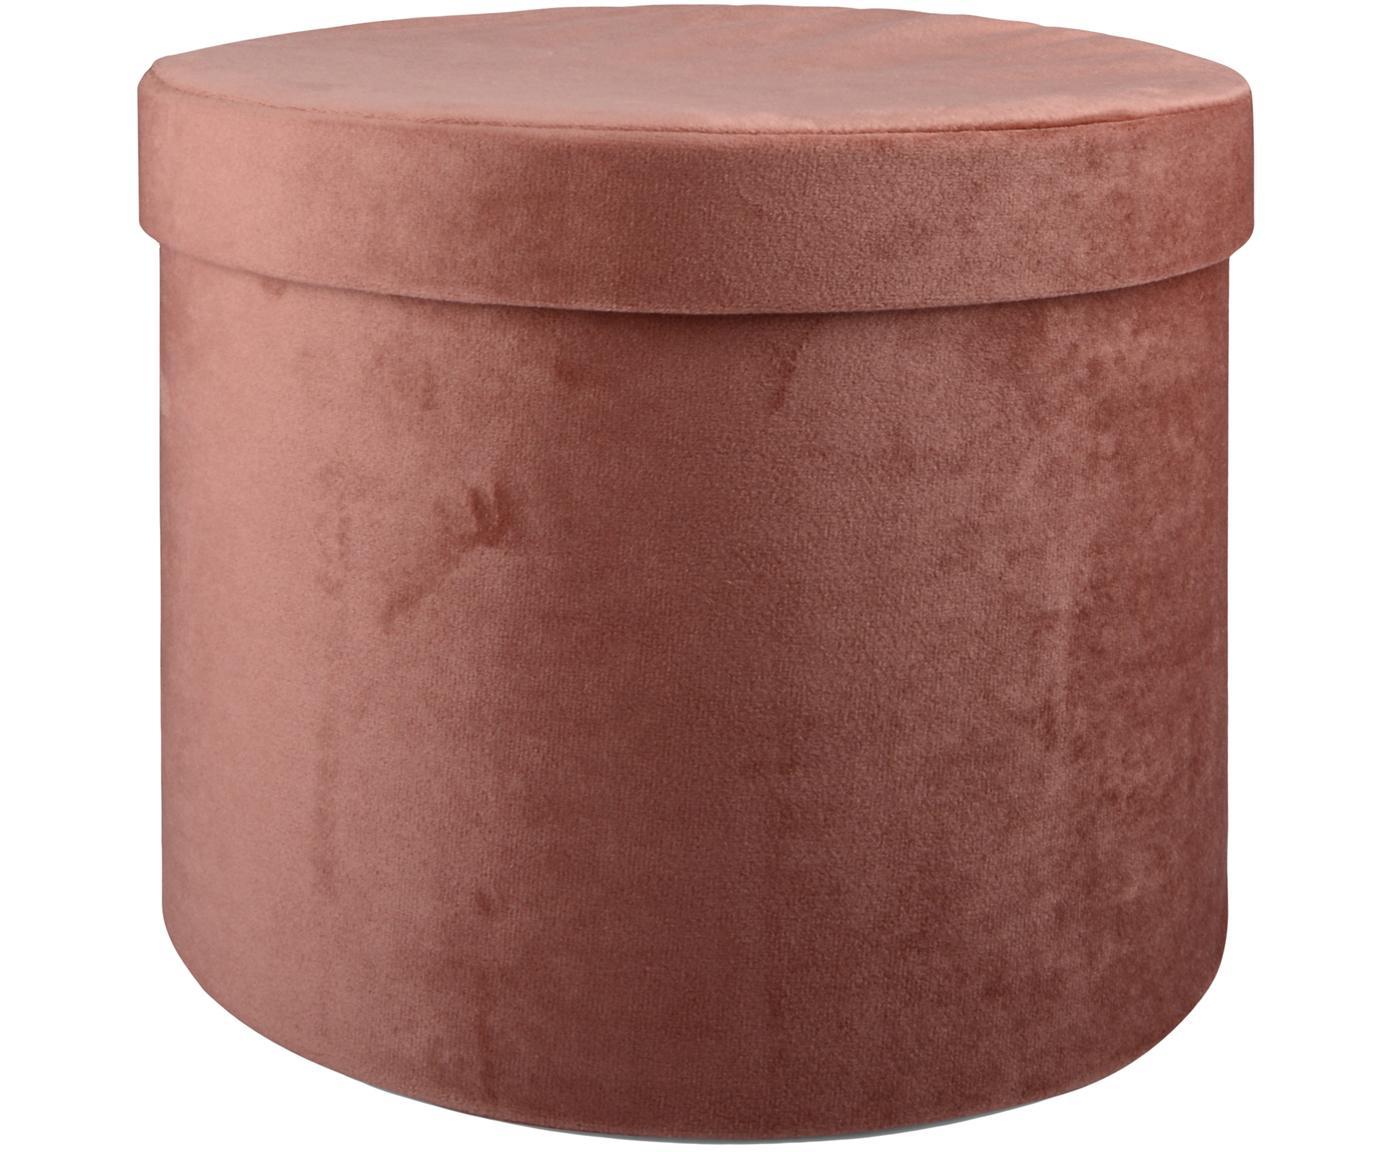 Samt-Geschenkboxen Ivetta, 2 Stück, Samt, Pink, Ø 29 x H 22 cm